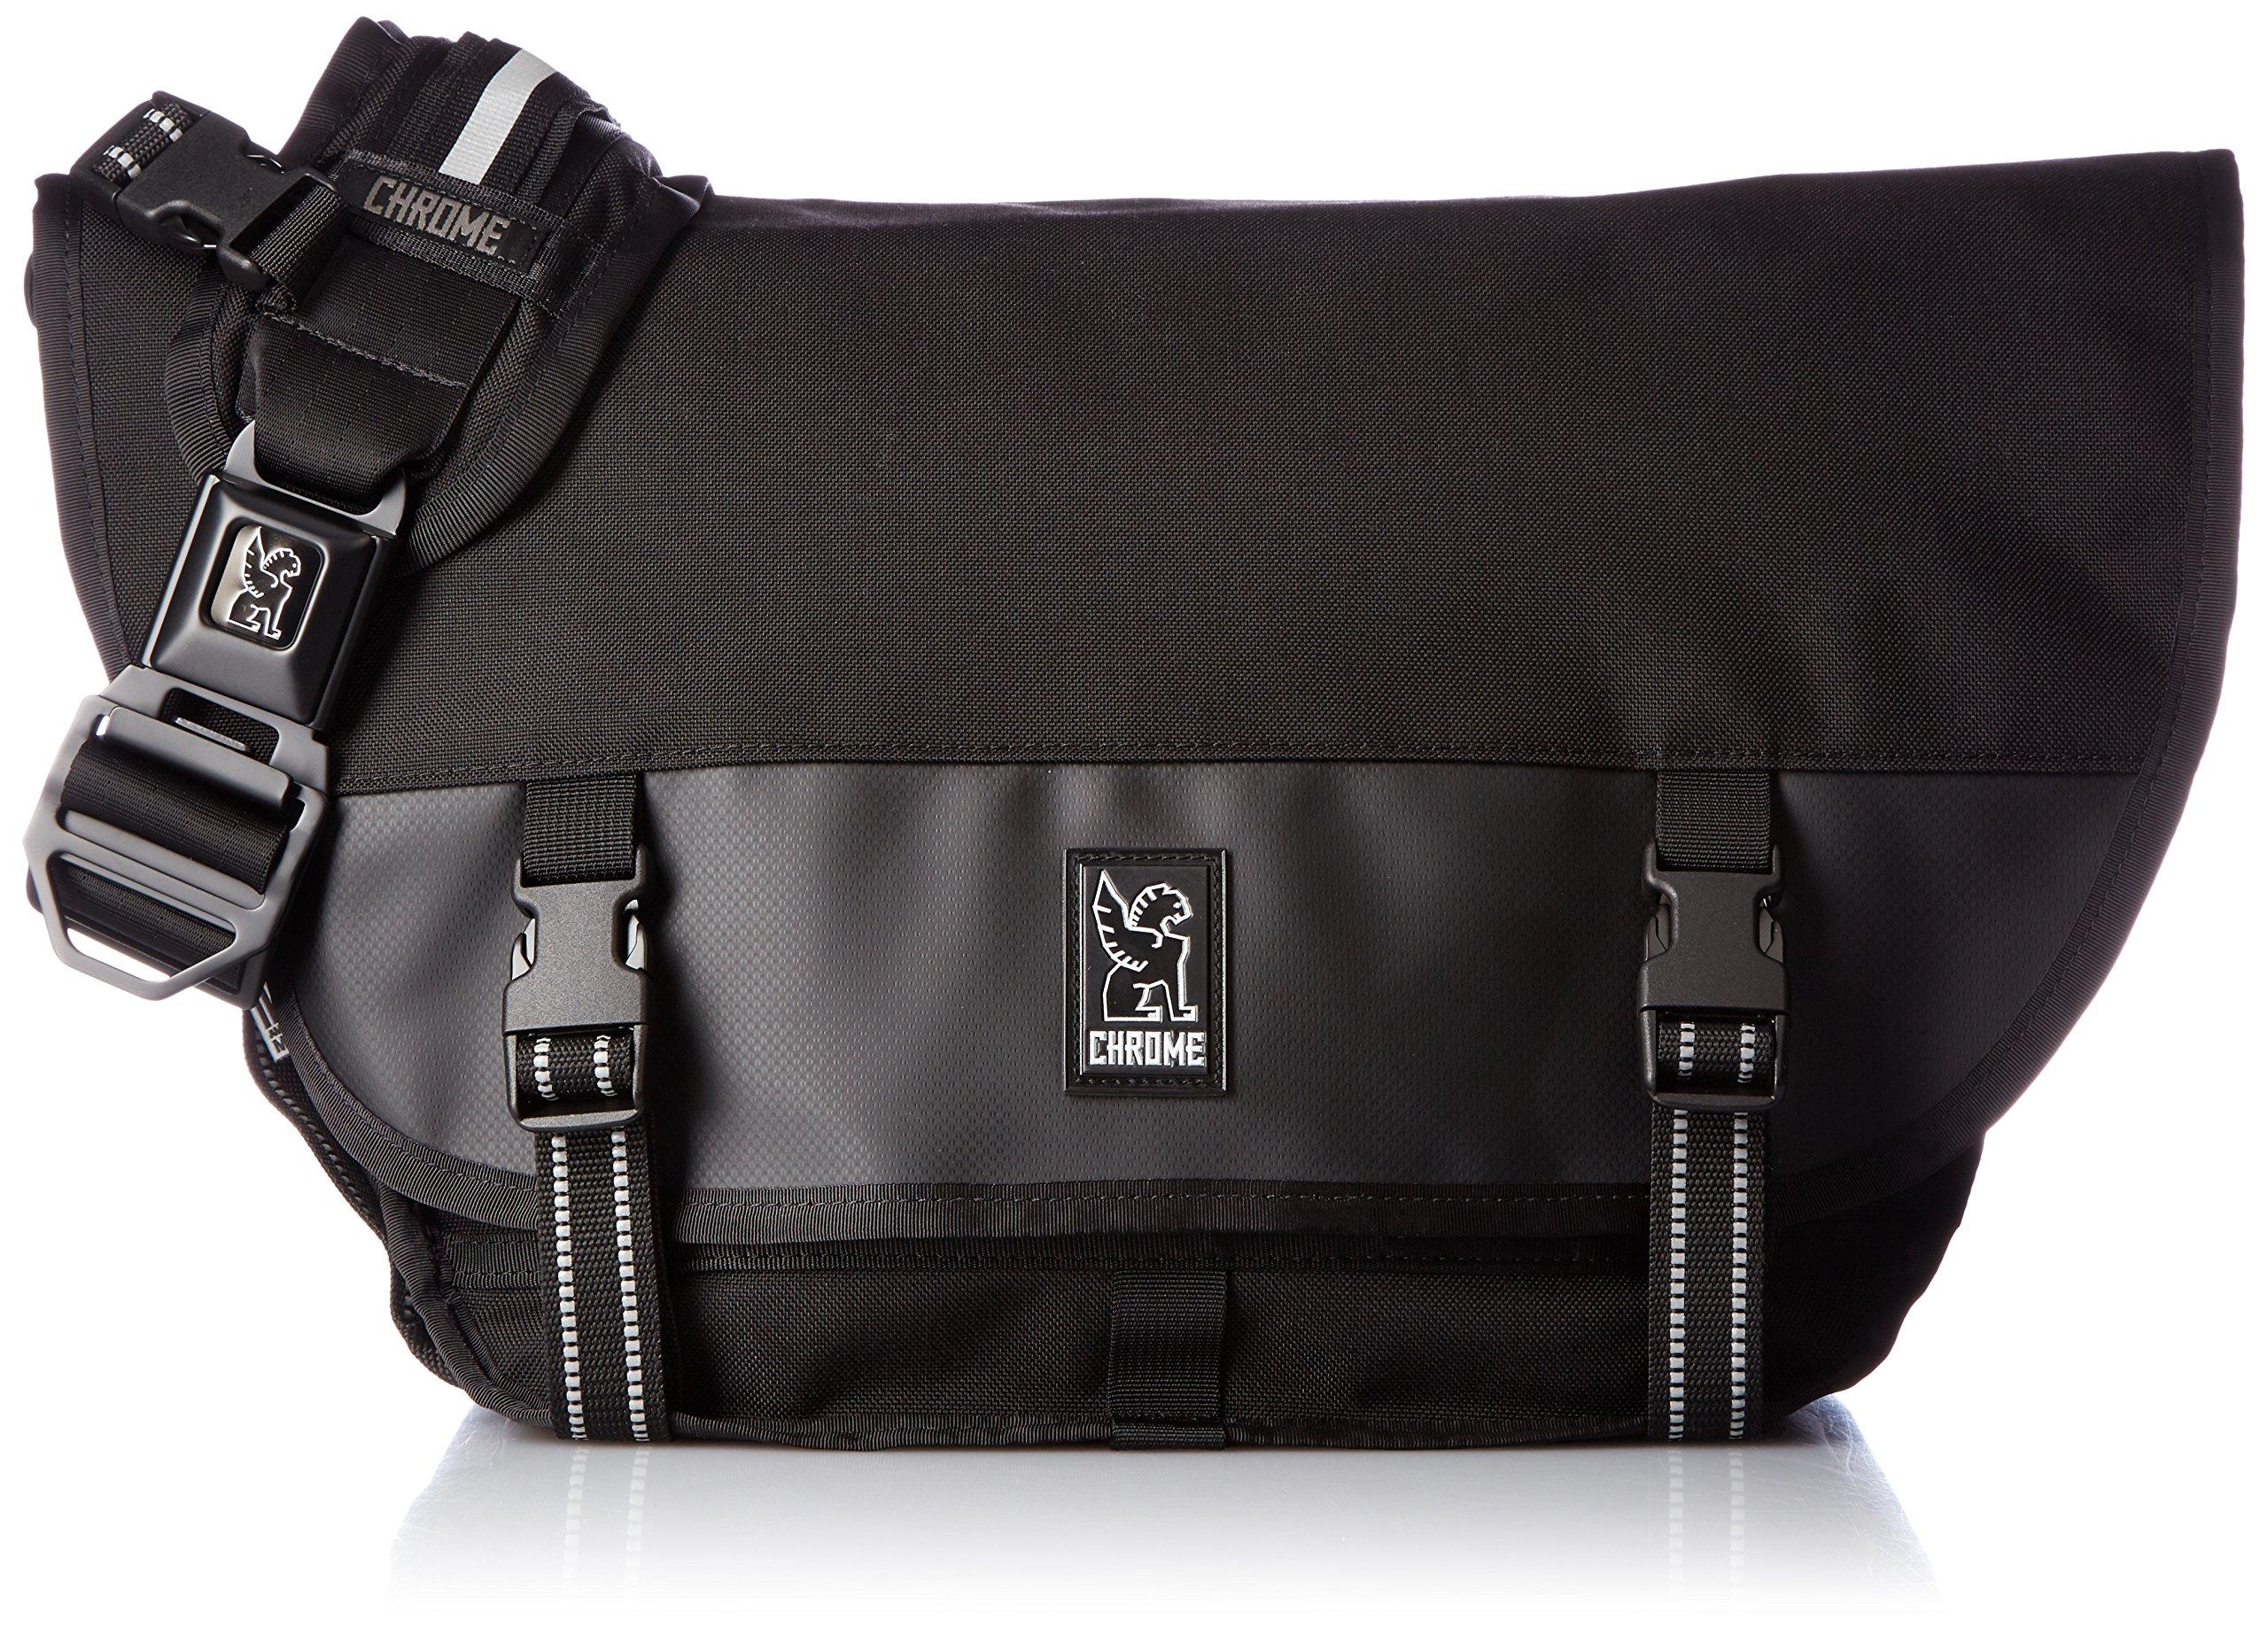 Chrome Industries Mini Metro Messenger Bag 15-inch Laptop Satchel Liter Black